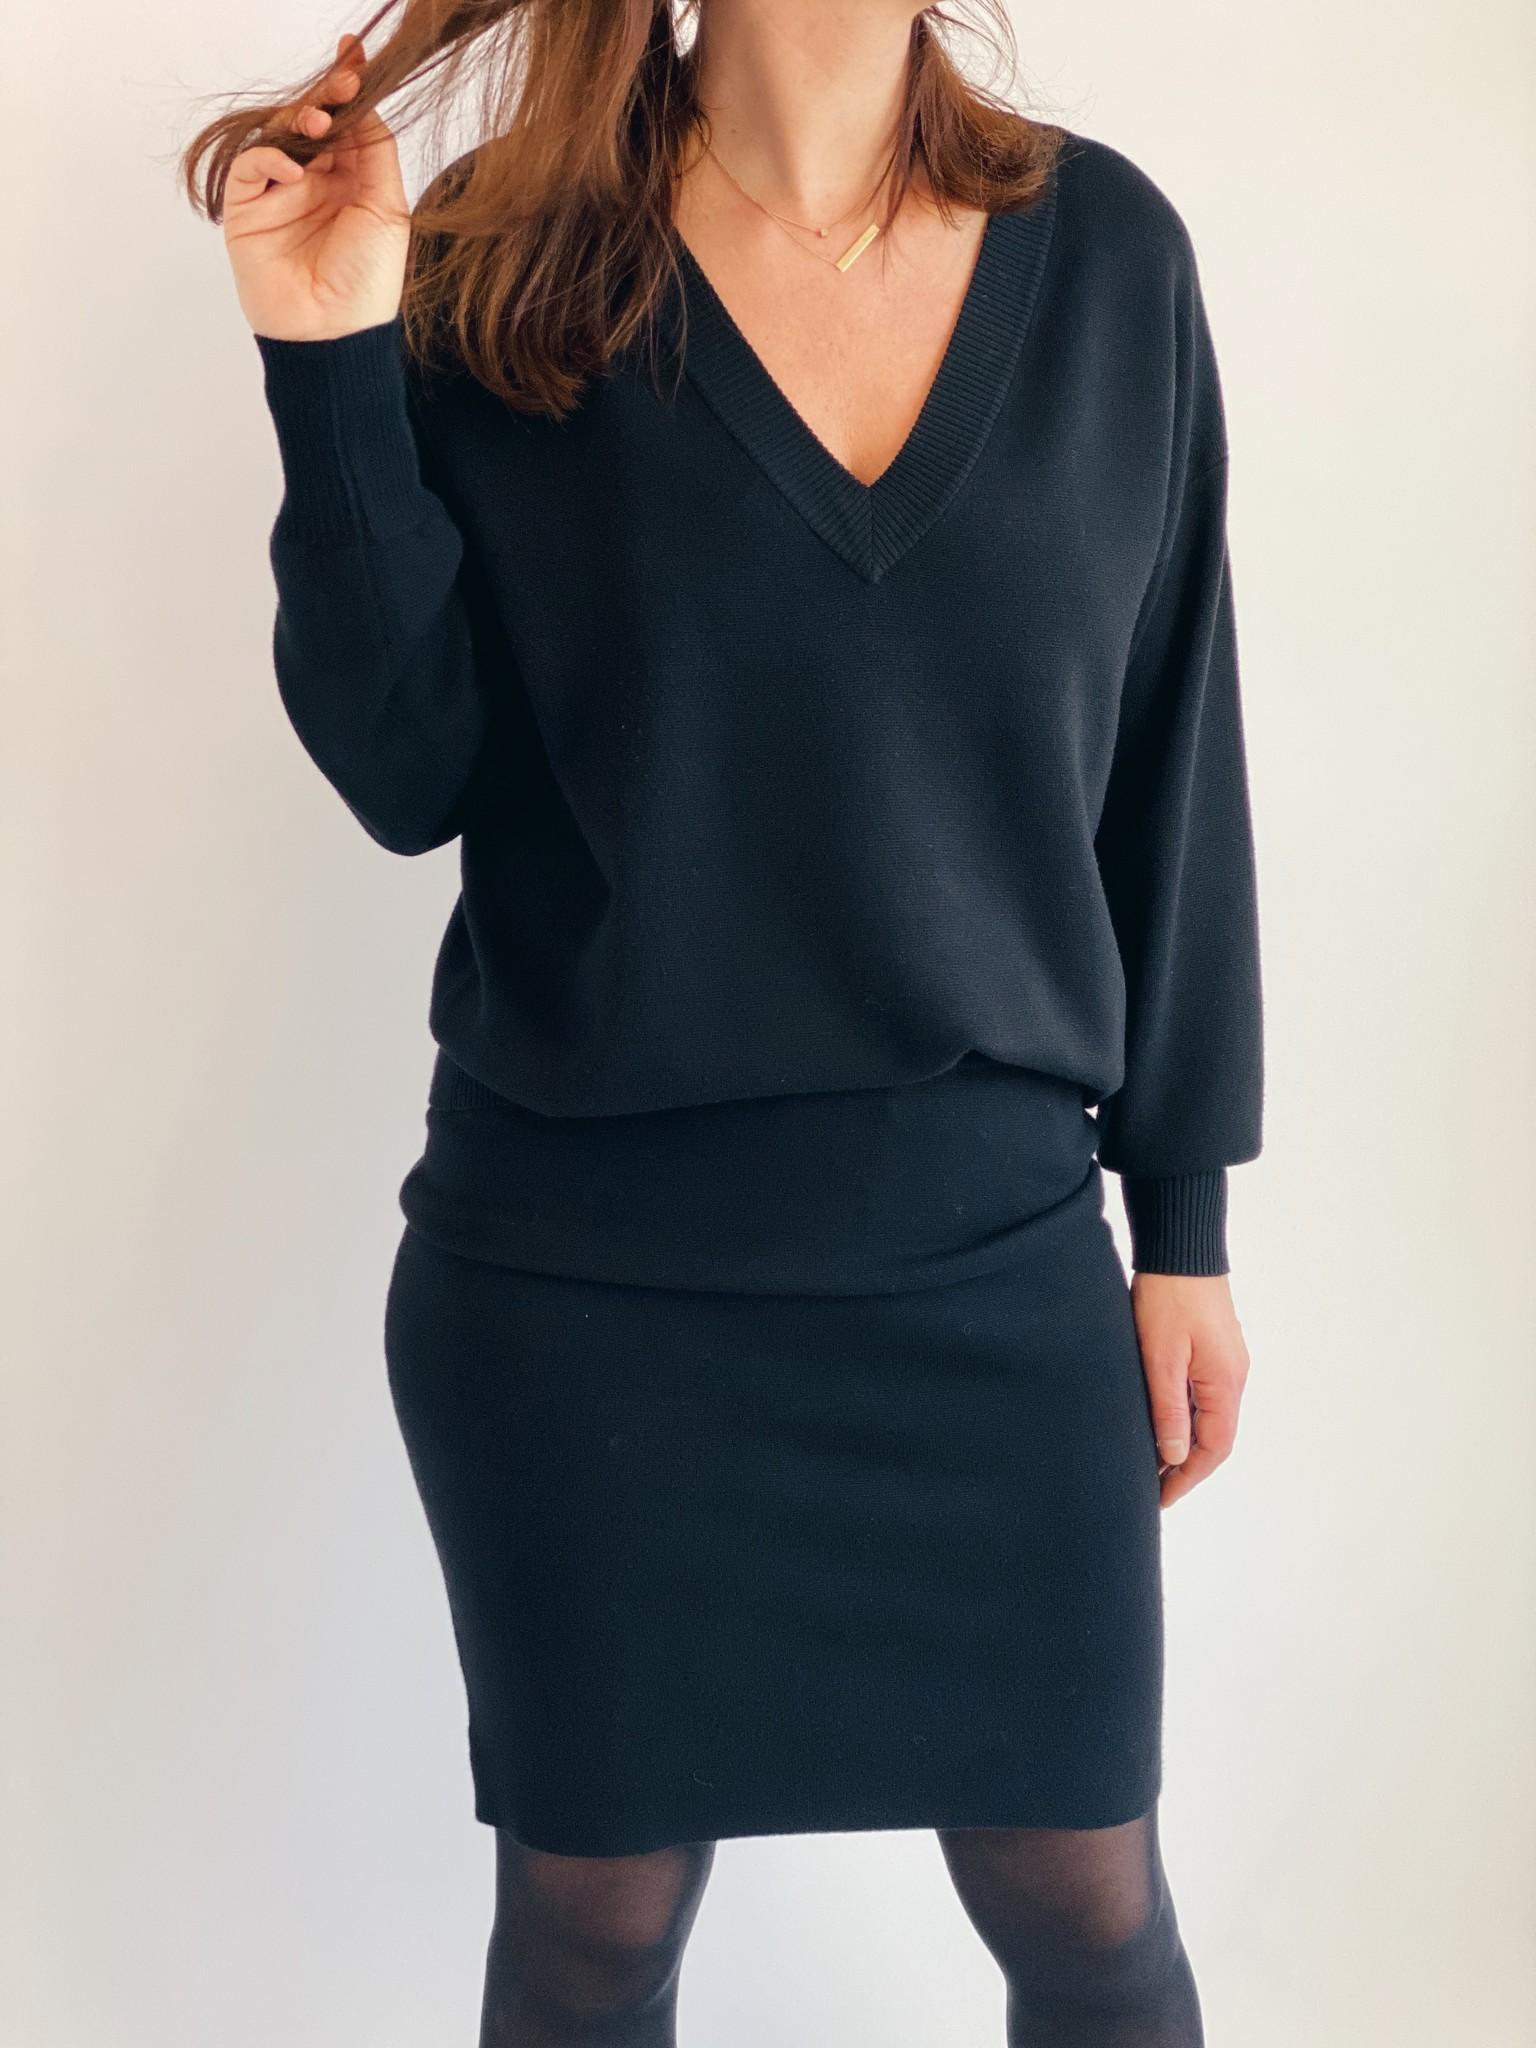 Rok KAkitlyn knit skirt black deep-2